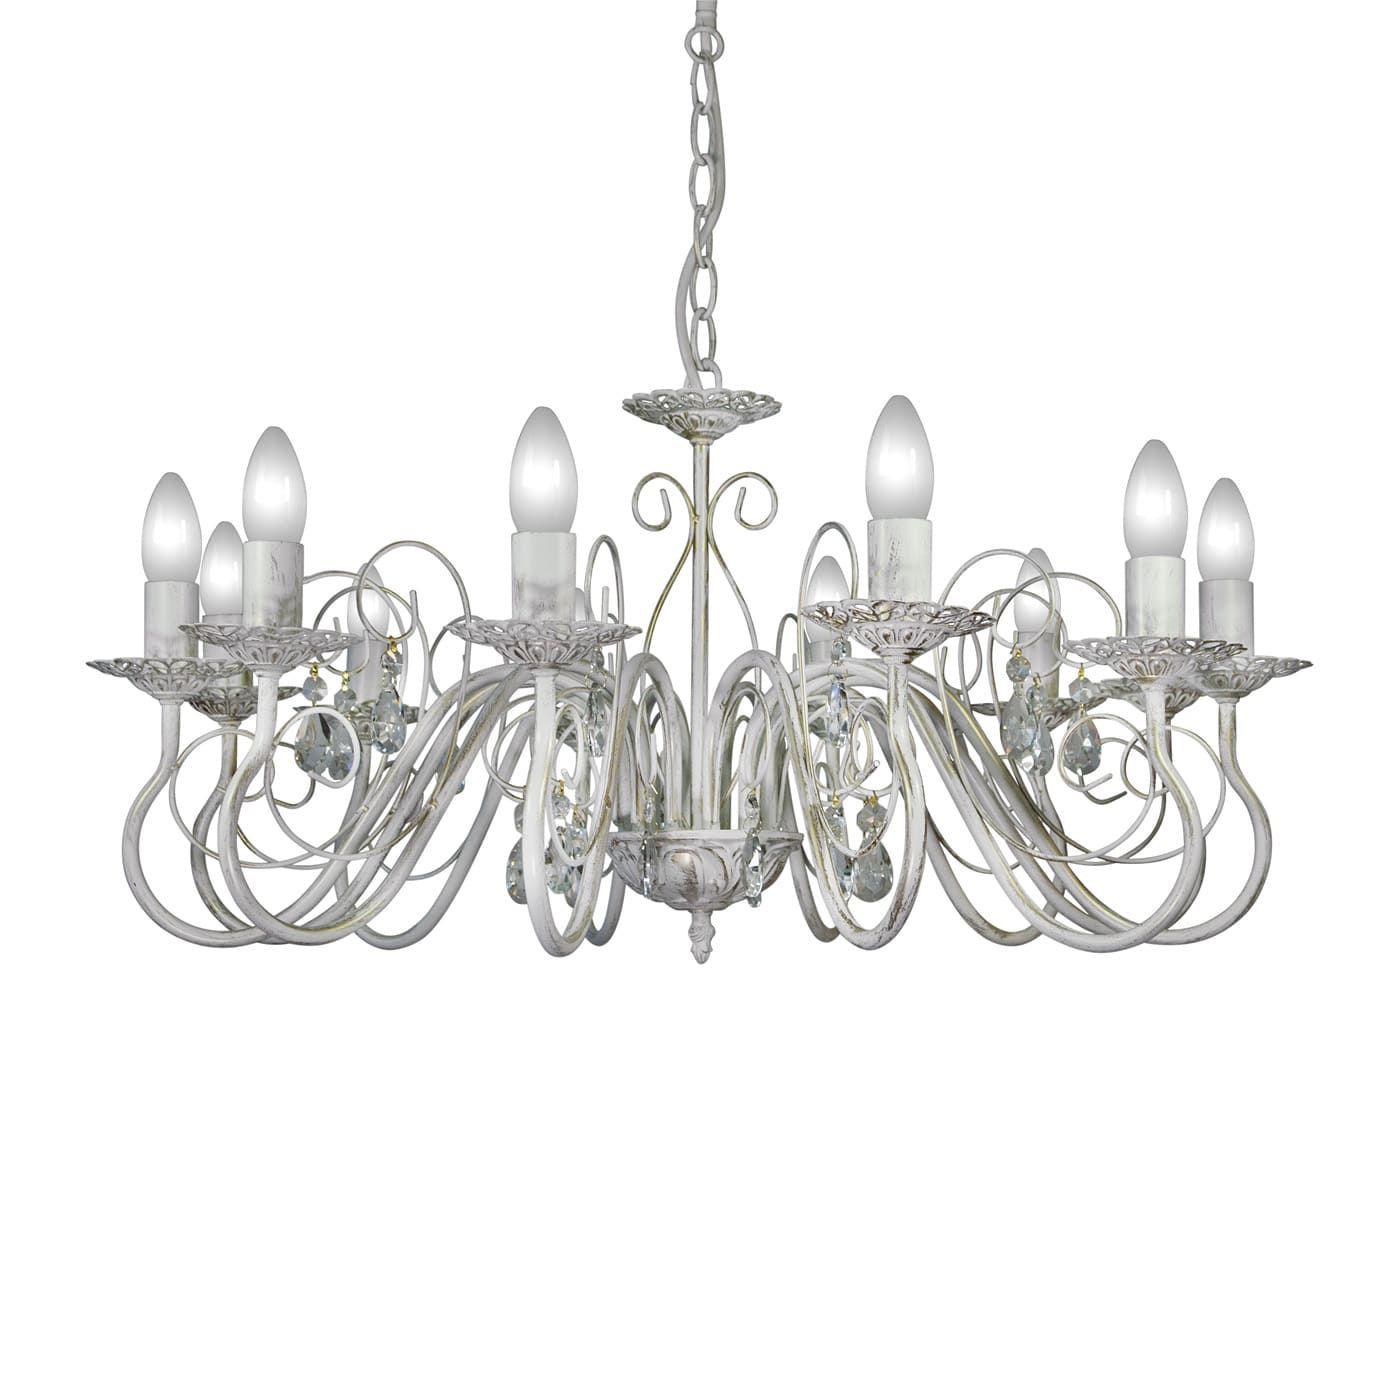 PETRASVET / Pendant chandelier S1161-12, 12xE14 max. 60W